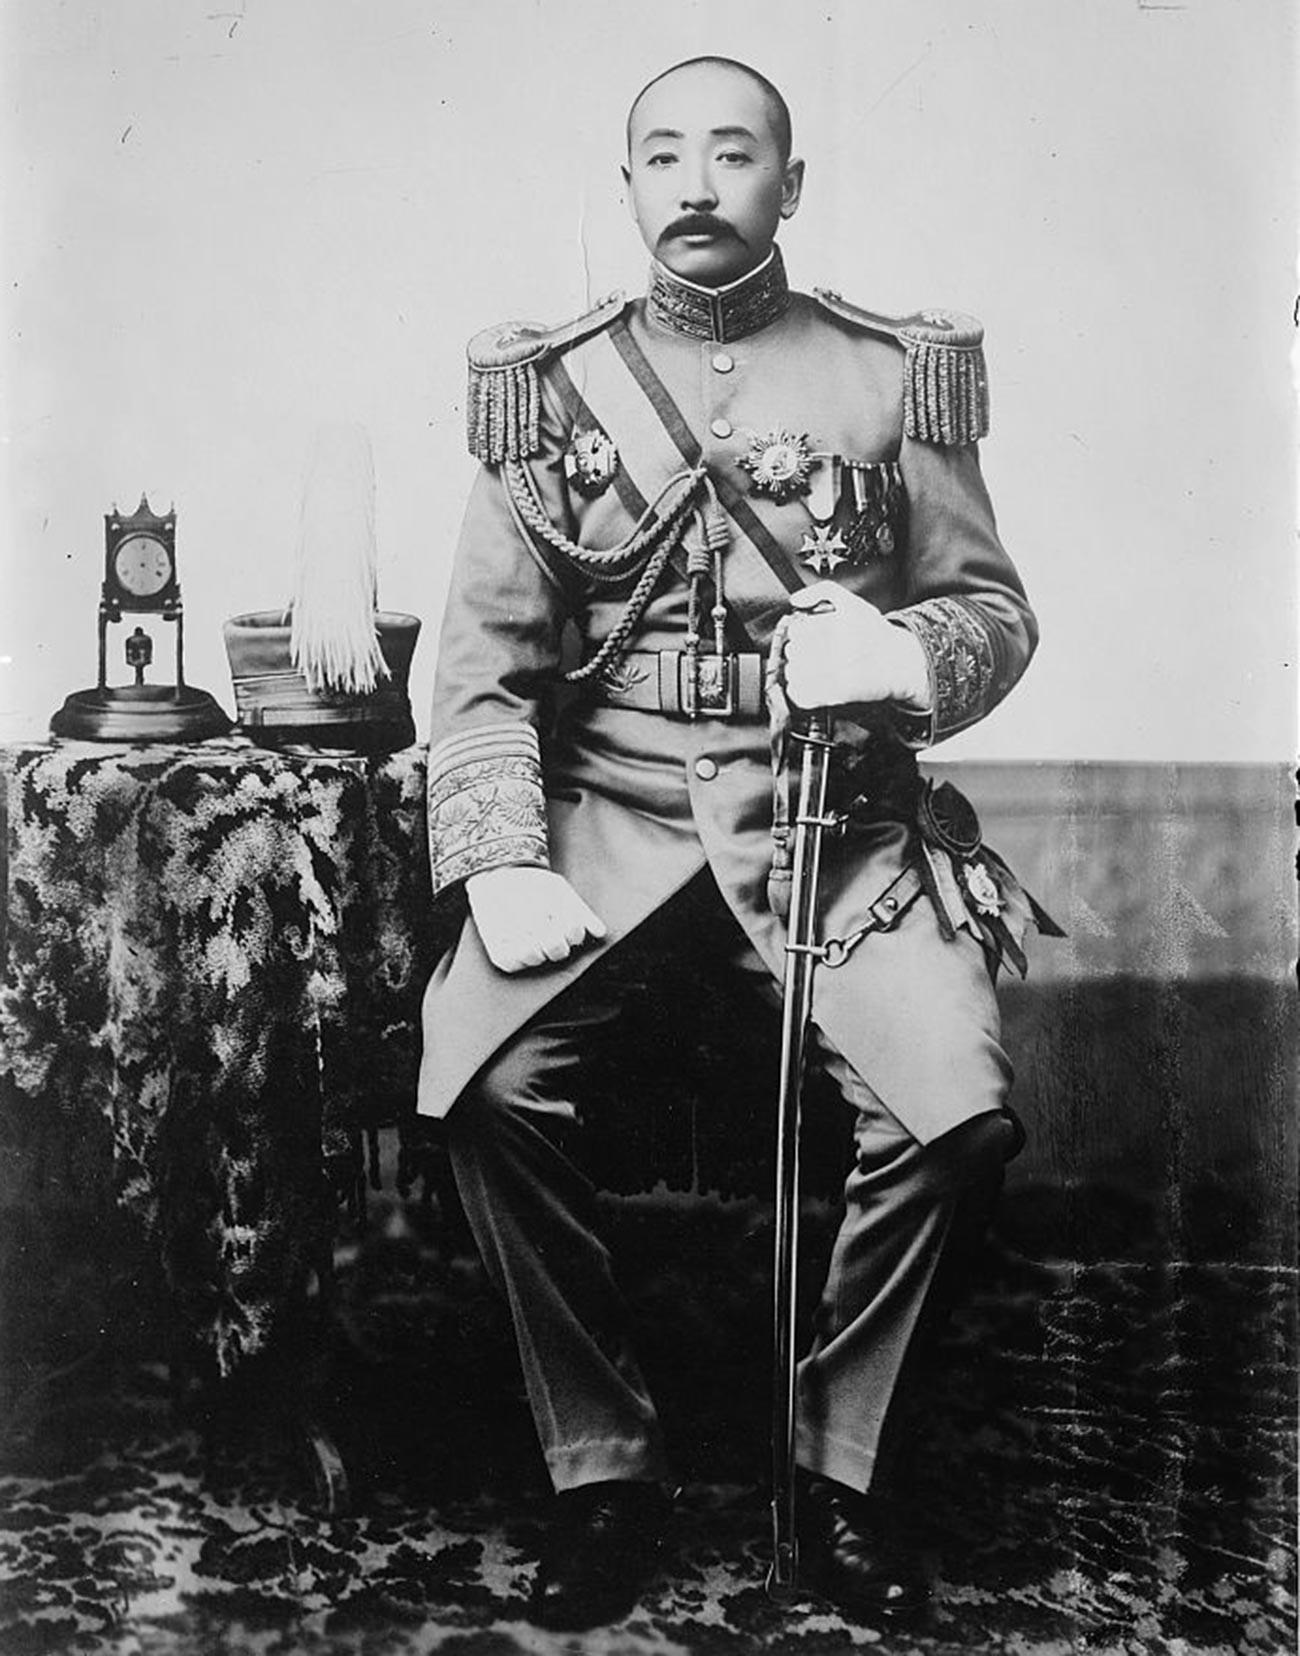 Китайският генерал и манджурски военачалник Джан Зуолин